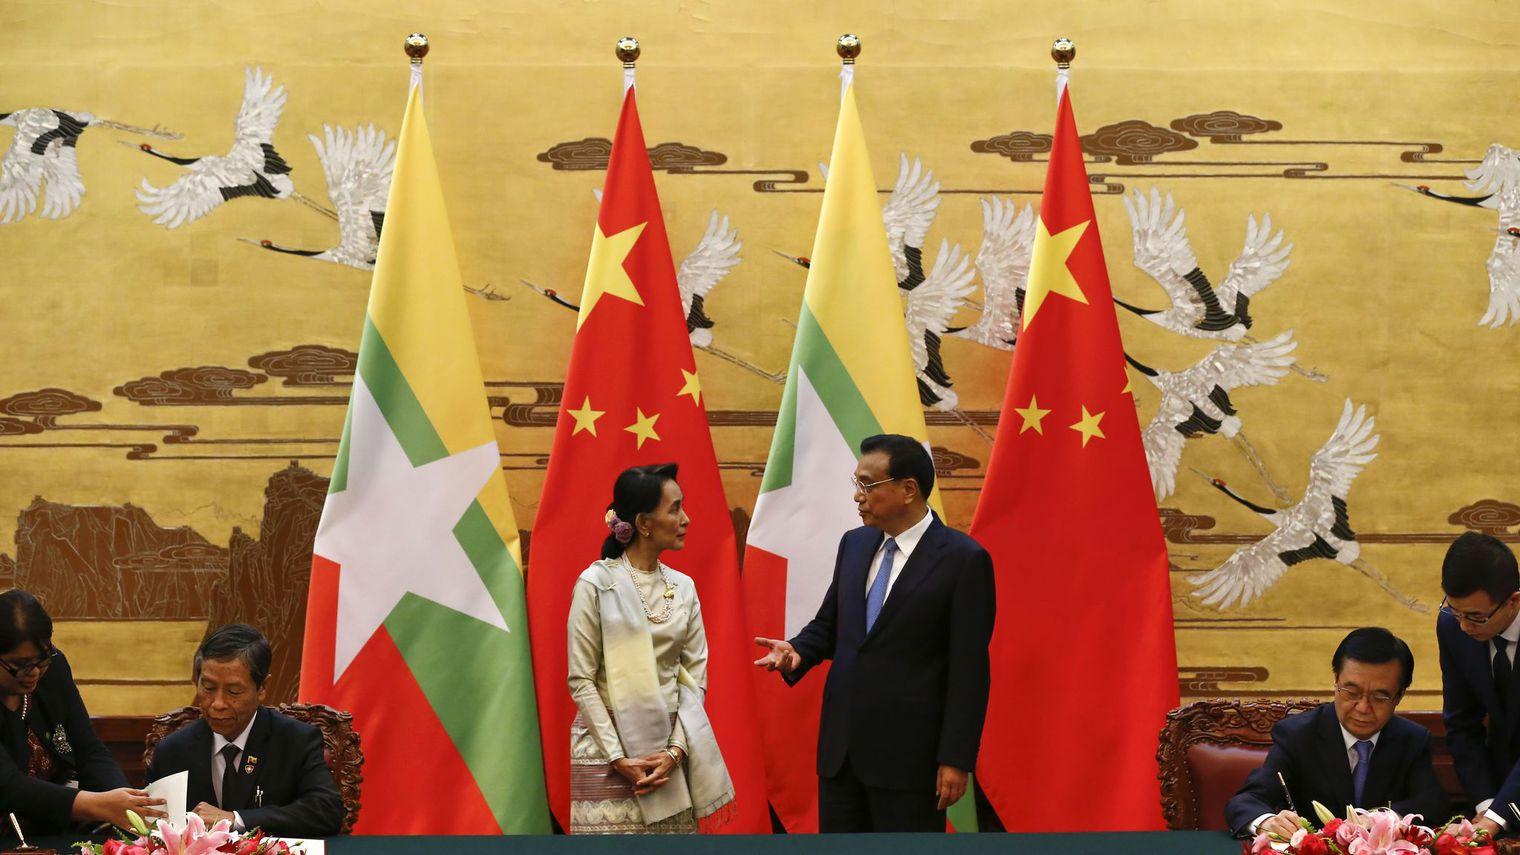 Barrage controversé : Pékin n'exploite pas abusivement la Birmanie, assure la presse chinoise